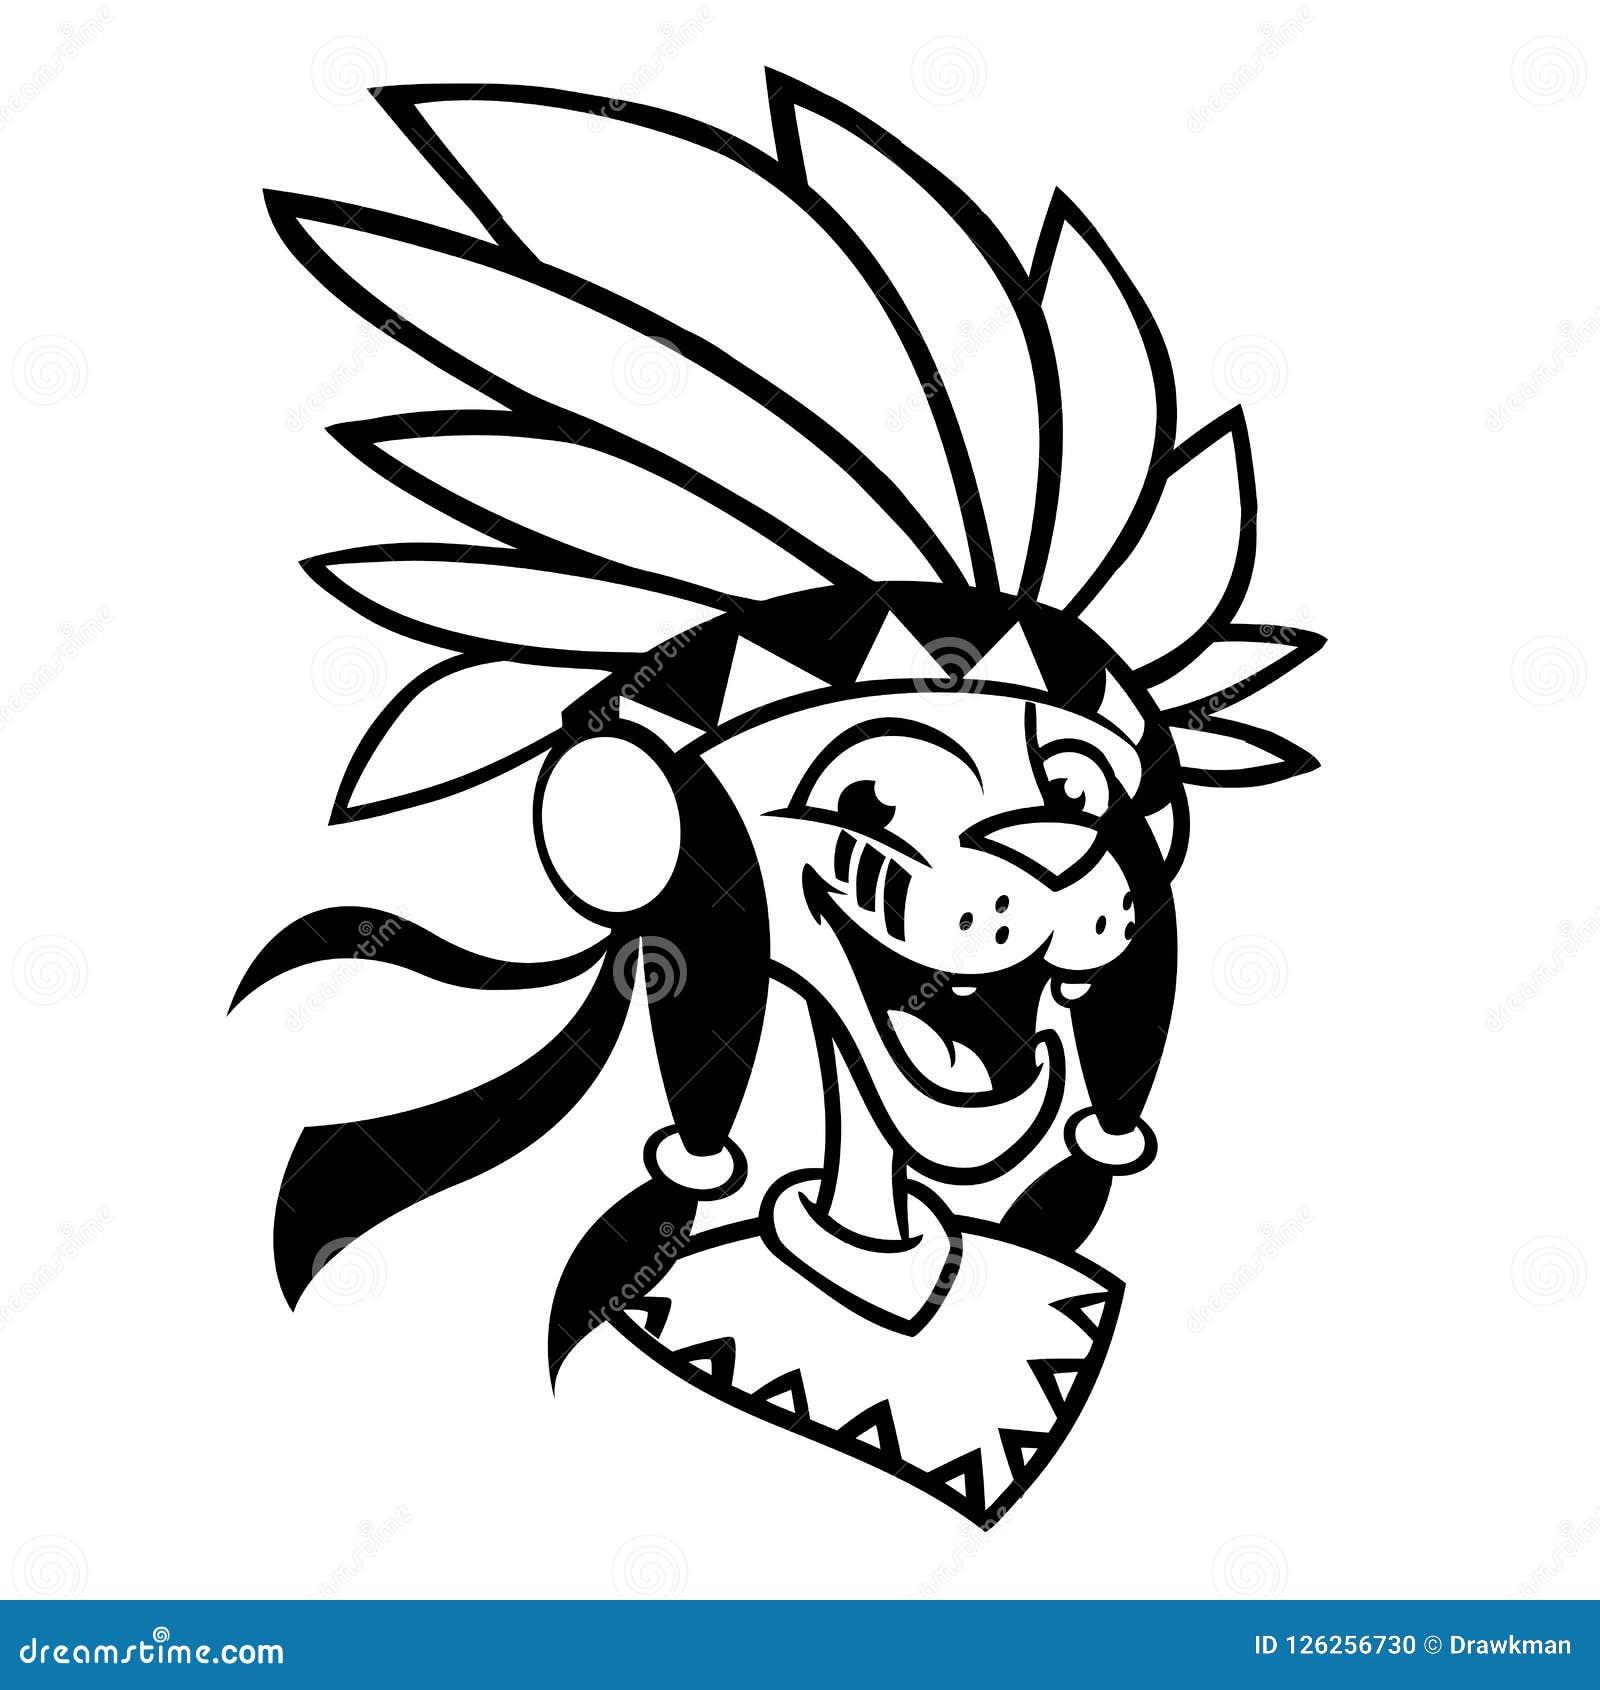 Cartoon Native American Character Coloring Book. Vector Illustration ...